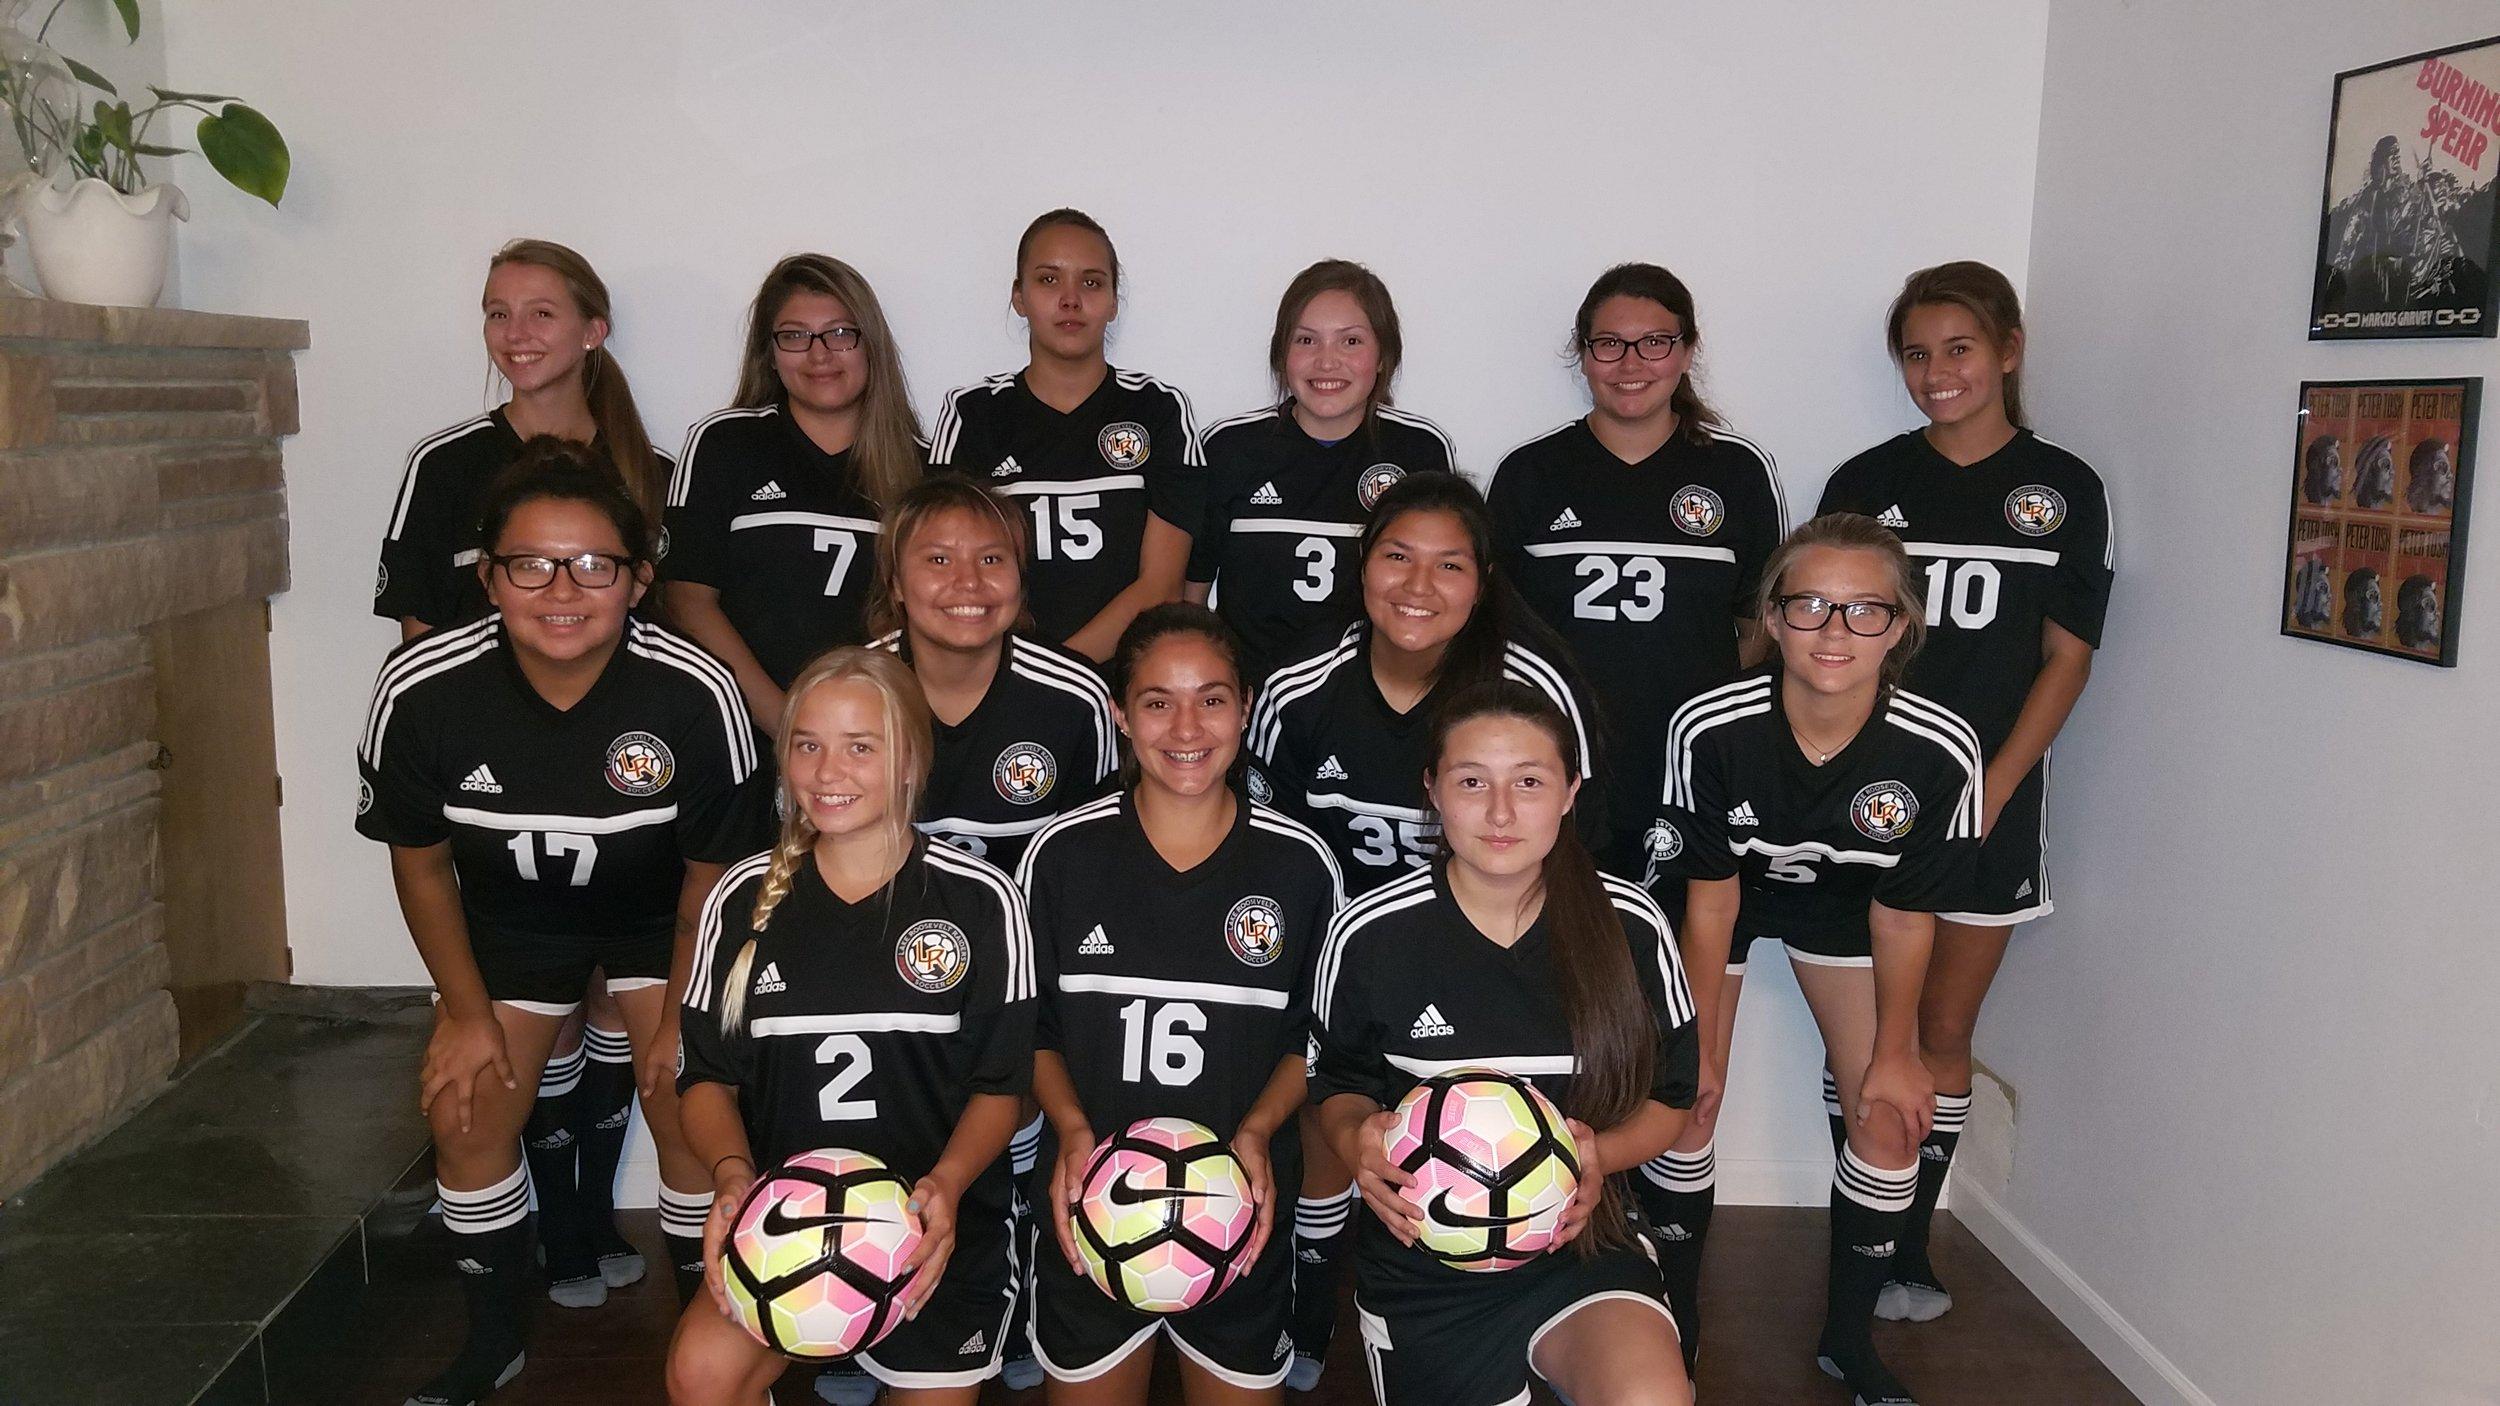 LRHS Girls Team.jpg